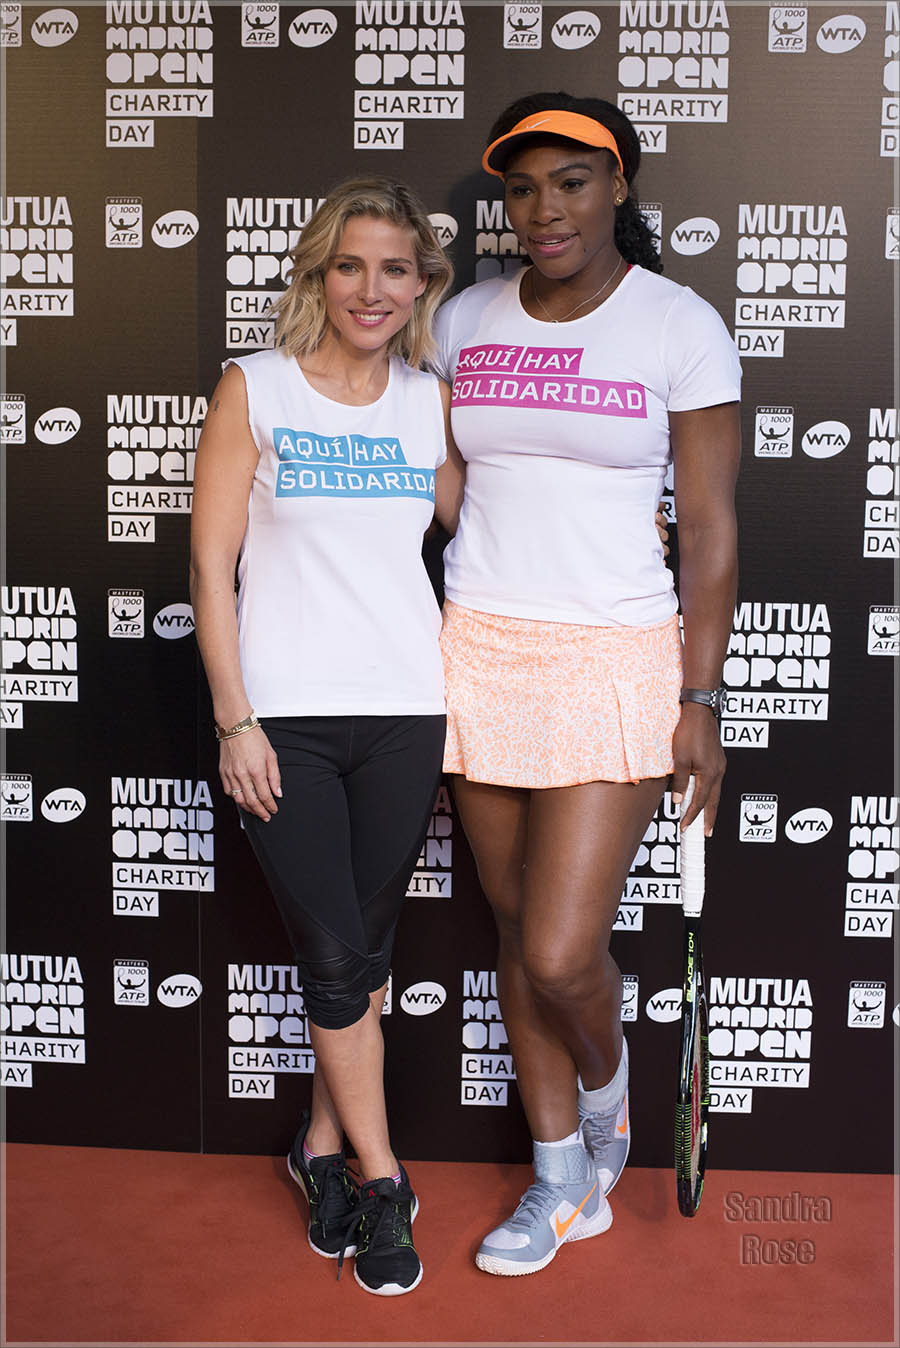 Elsa Pataky and Serena Williams at Mutua Madrid Open Charity Day